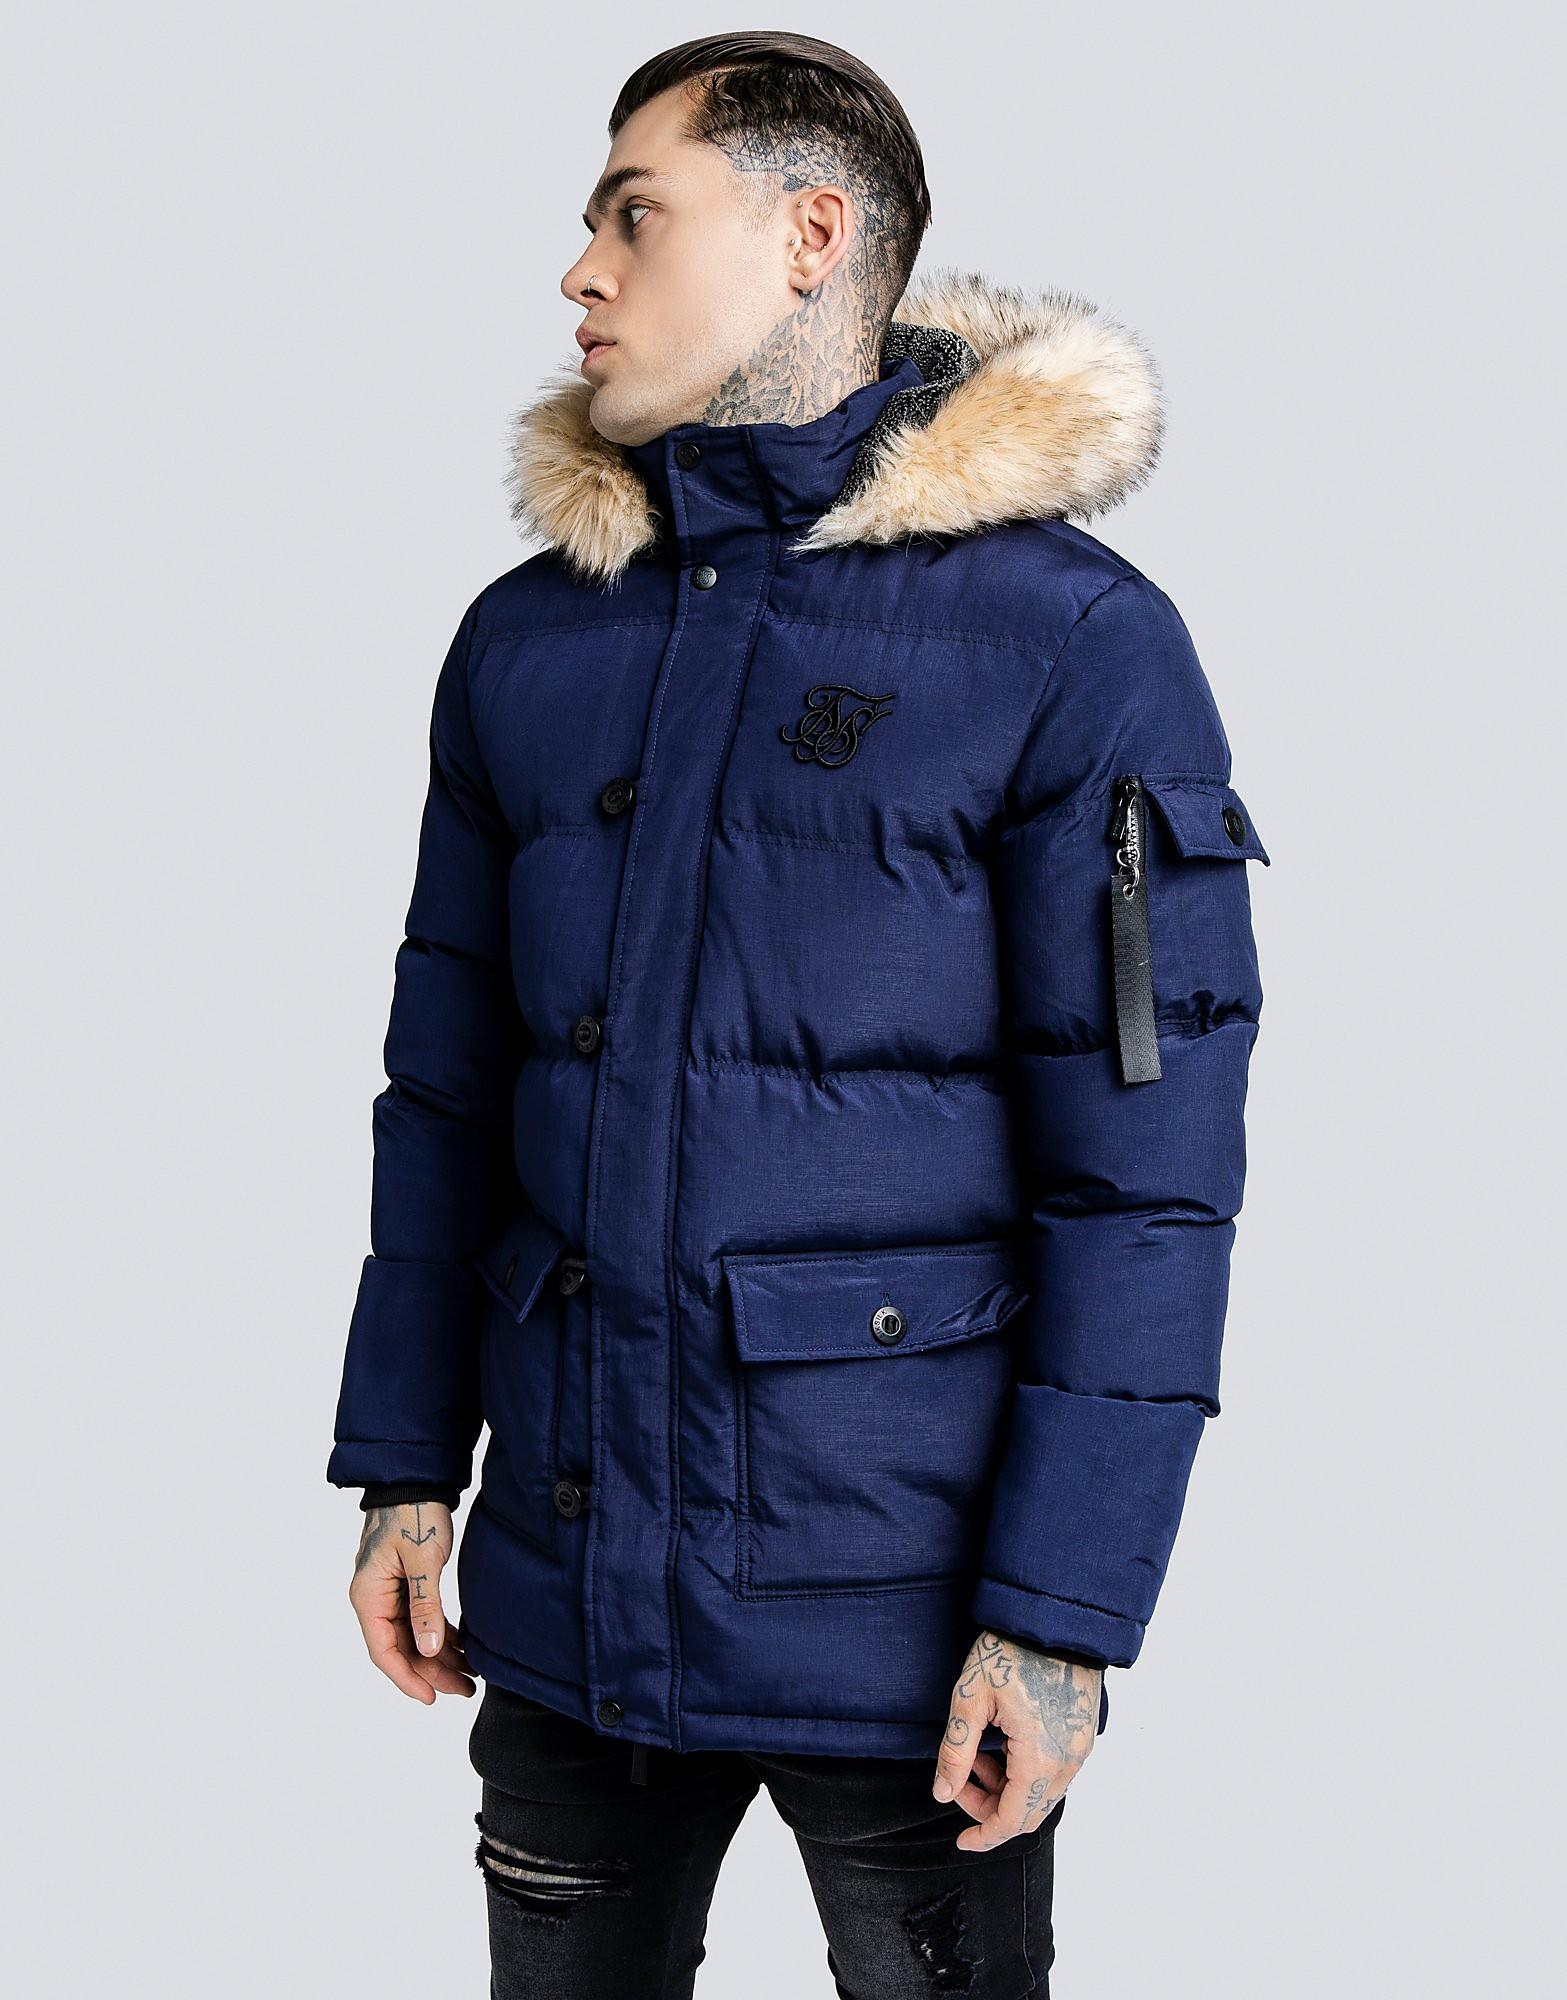 SikSilk Puffer Parka Jacket - Blauw - Heren